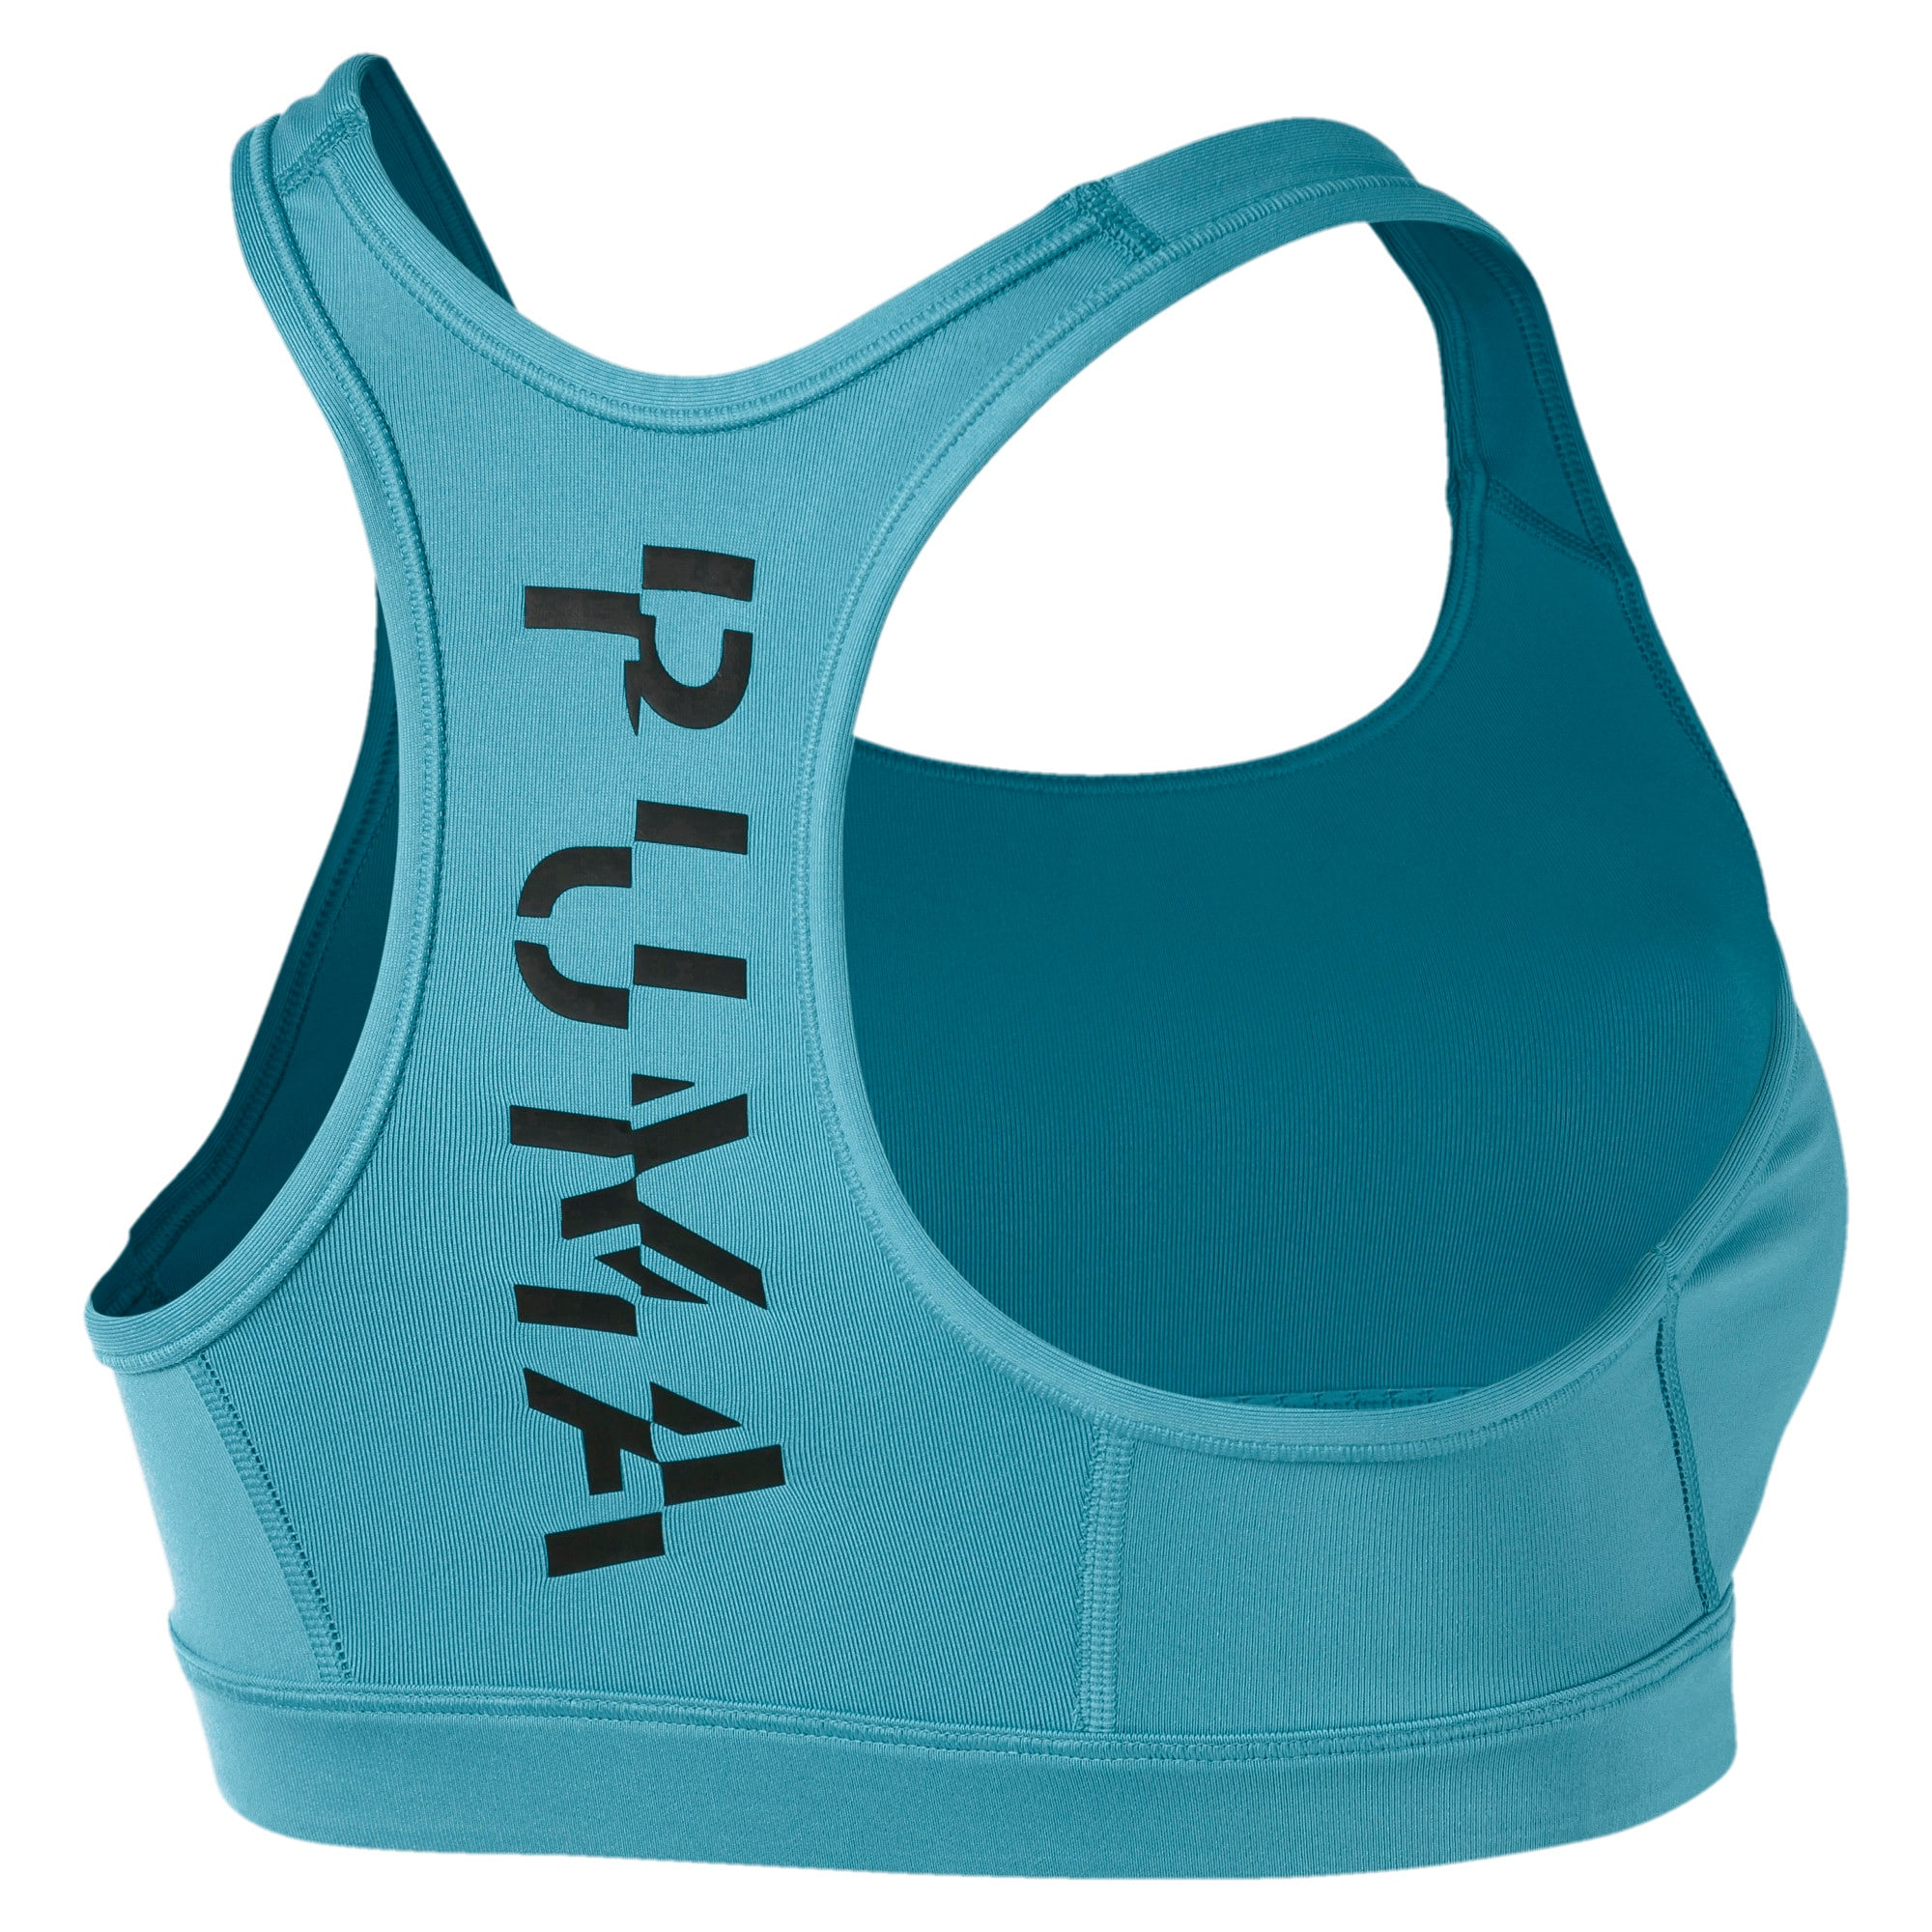 Thumbnail 5 of 4Keeps Mid Impact Women's Bra Top, Milky Blue, medium